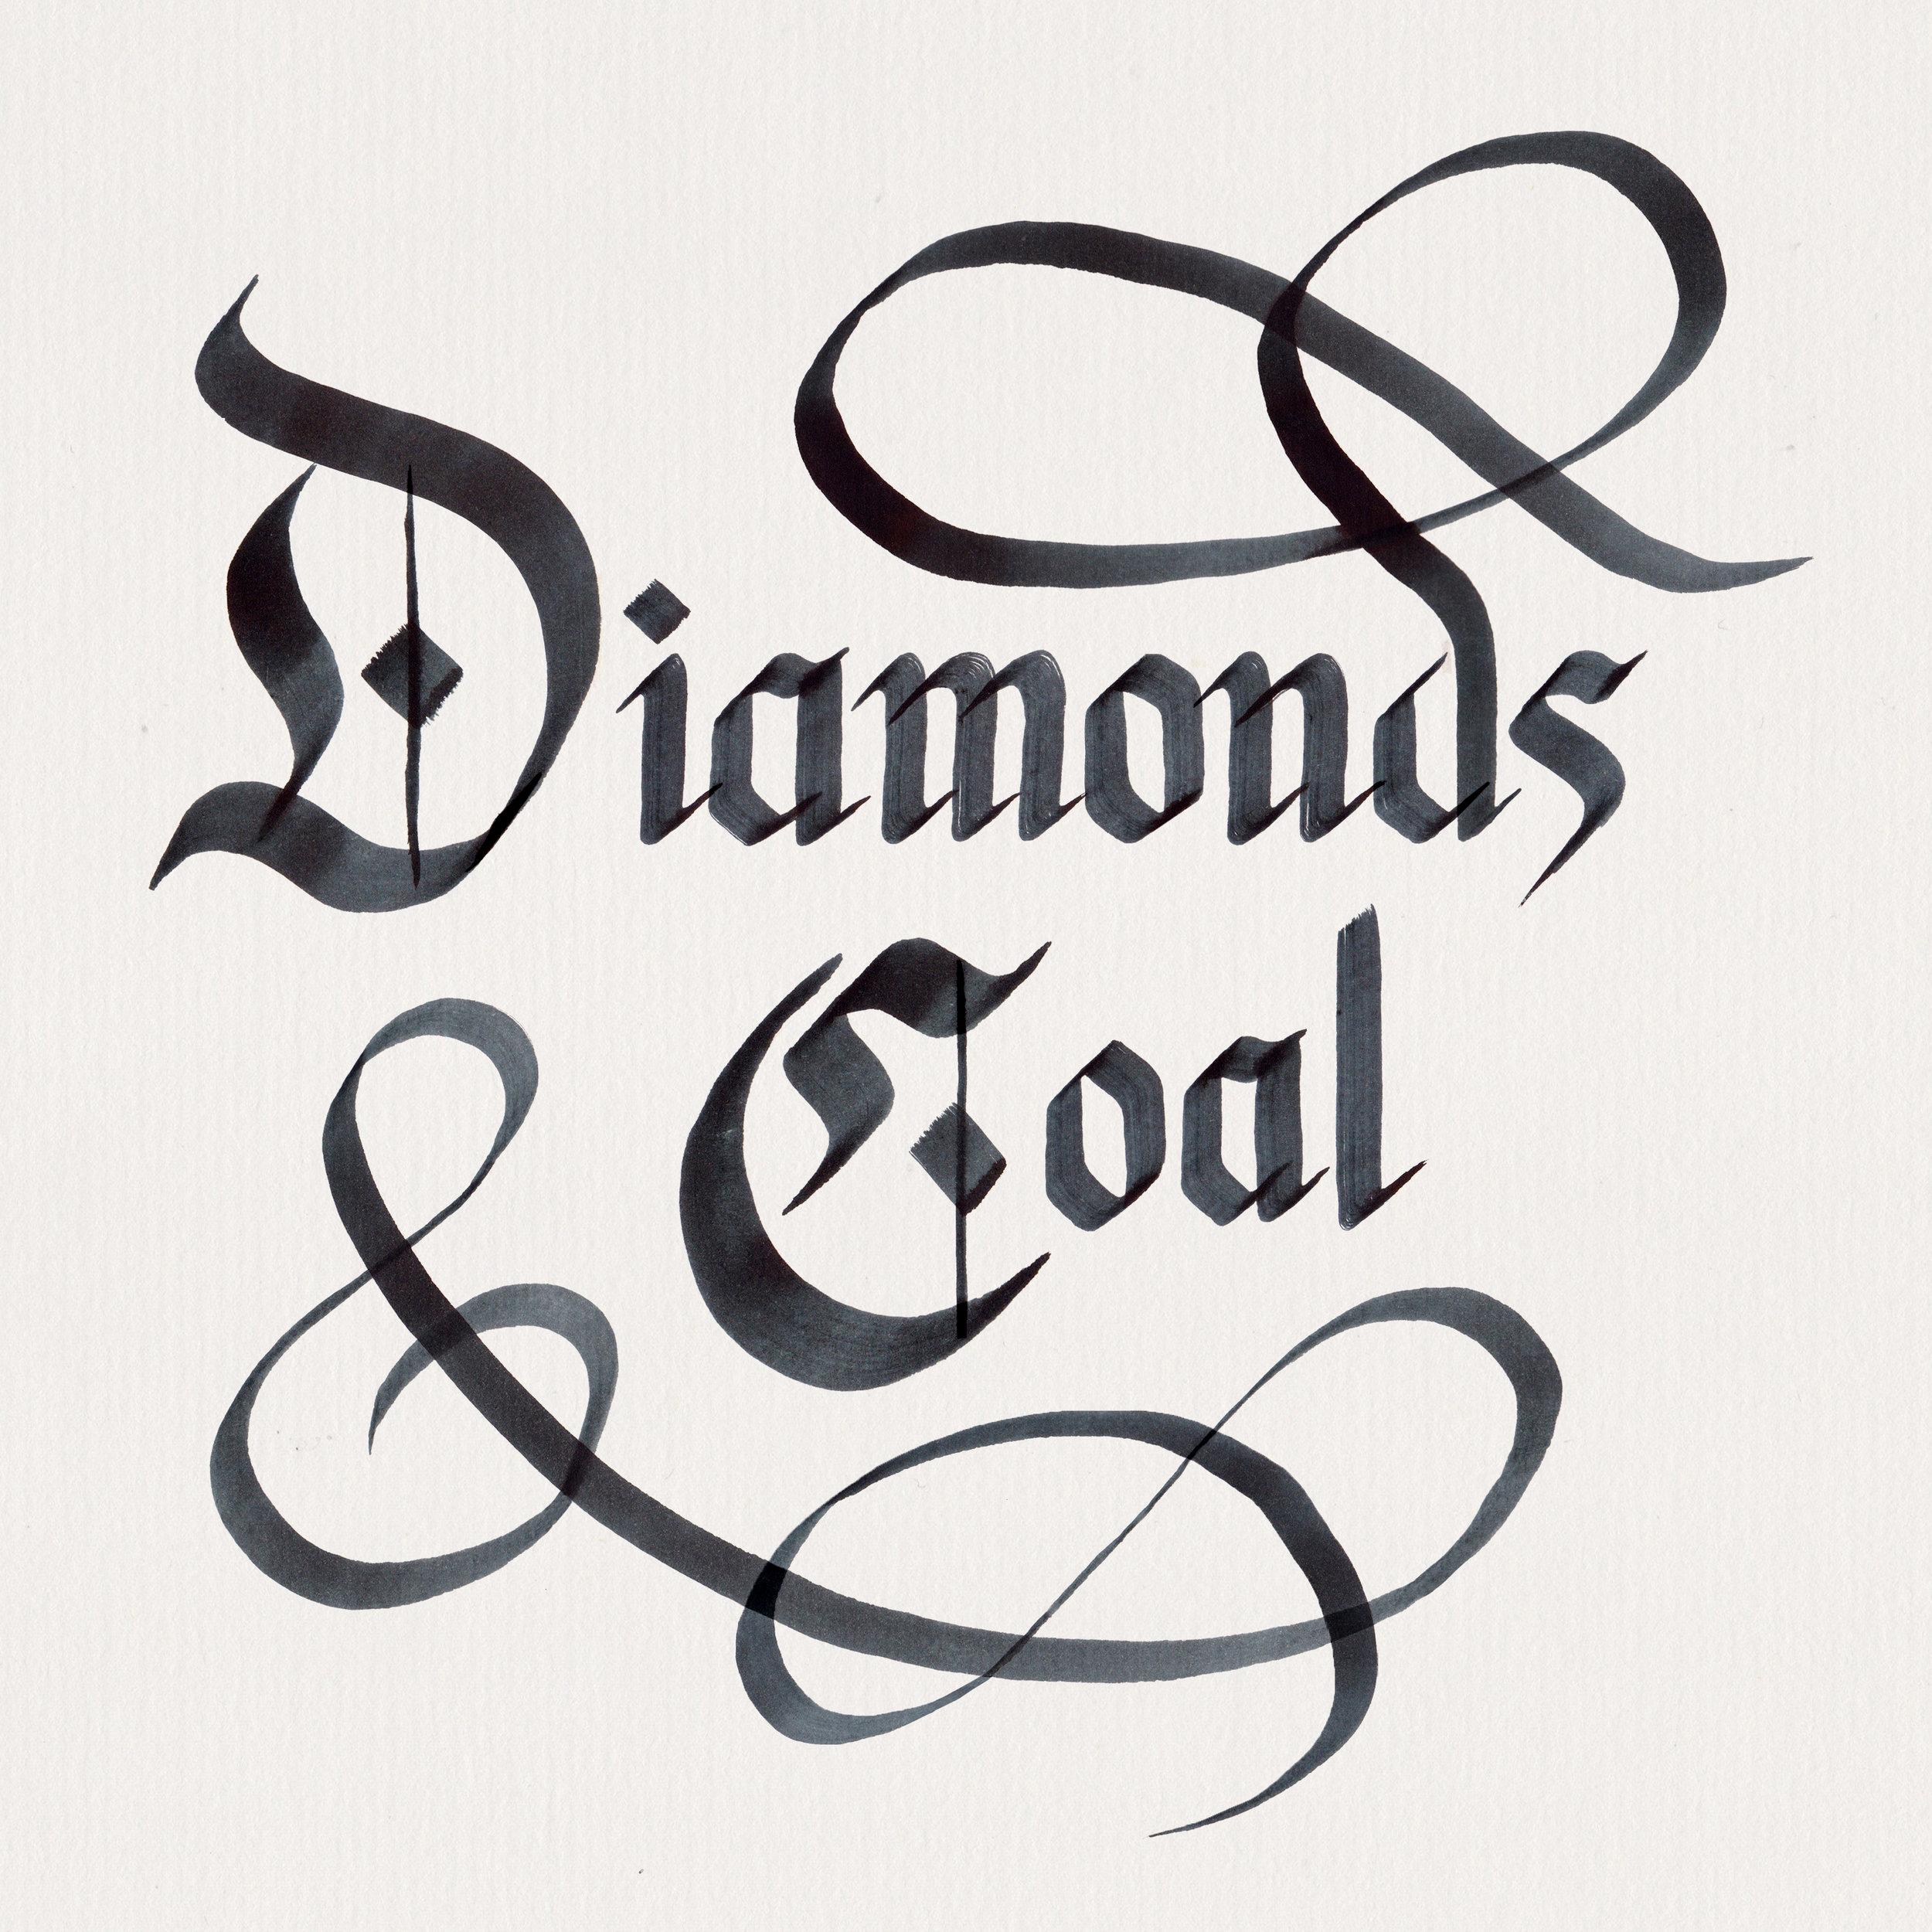 Diamonds and coal.jpg